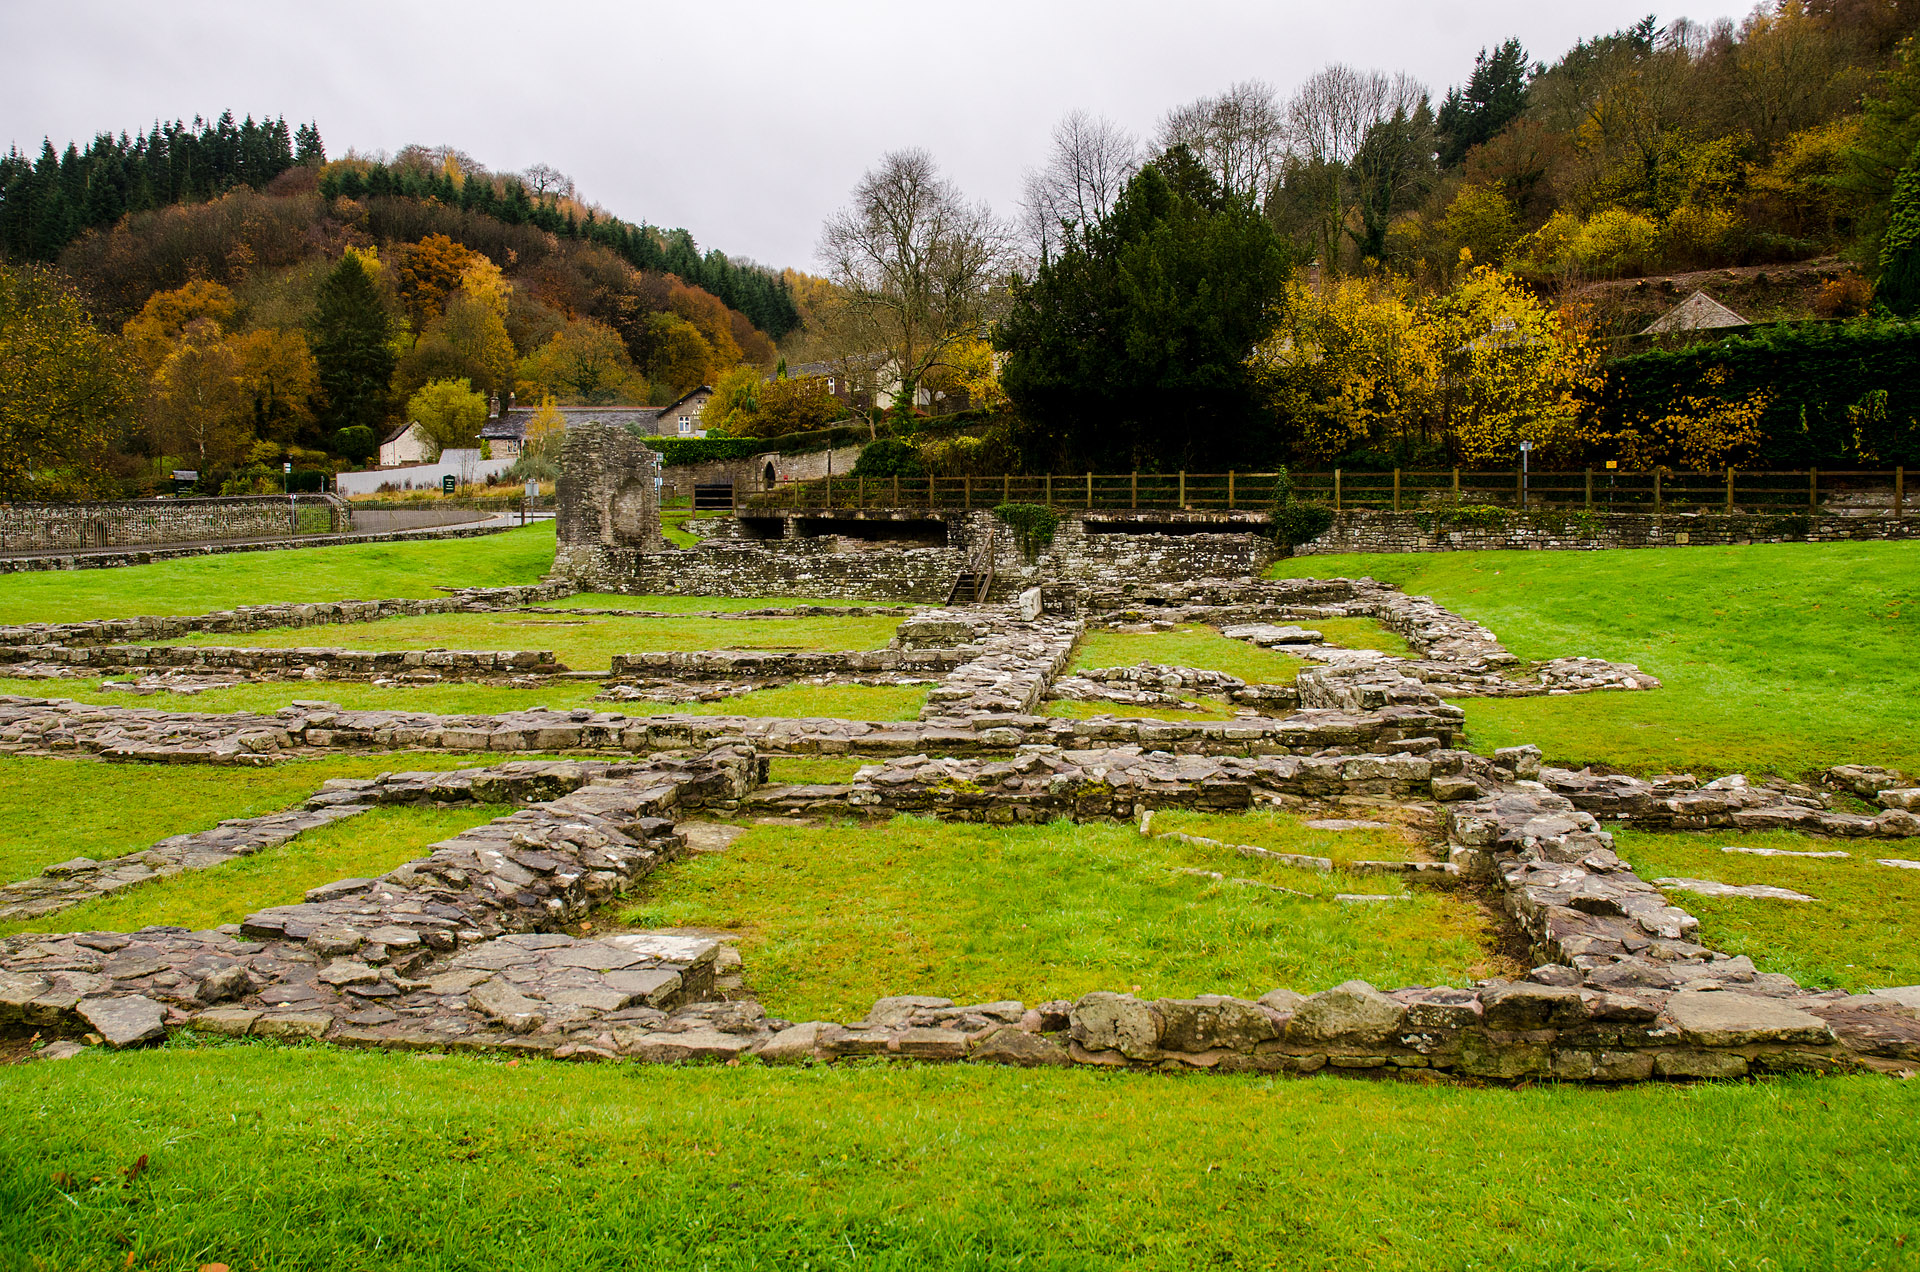 Tintern Abbey - central courtyard ruins